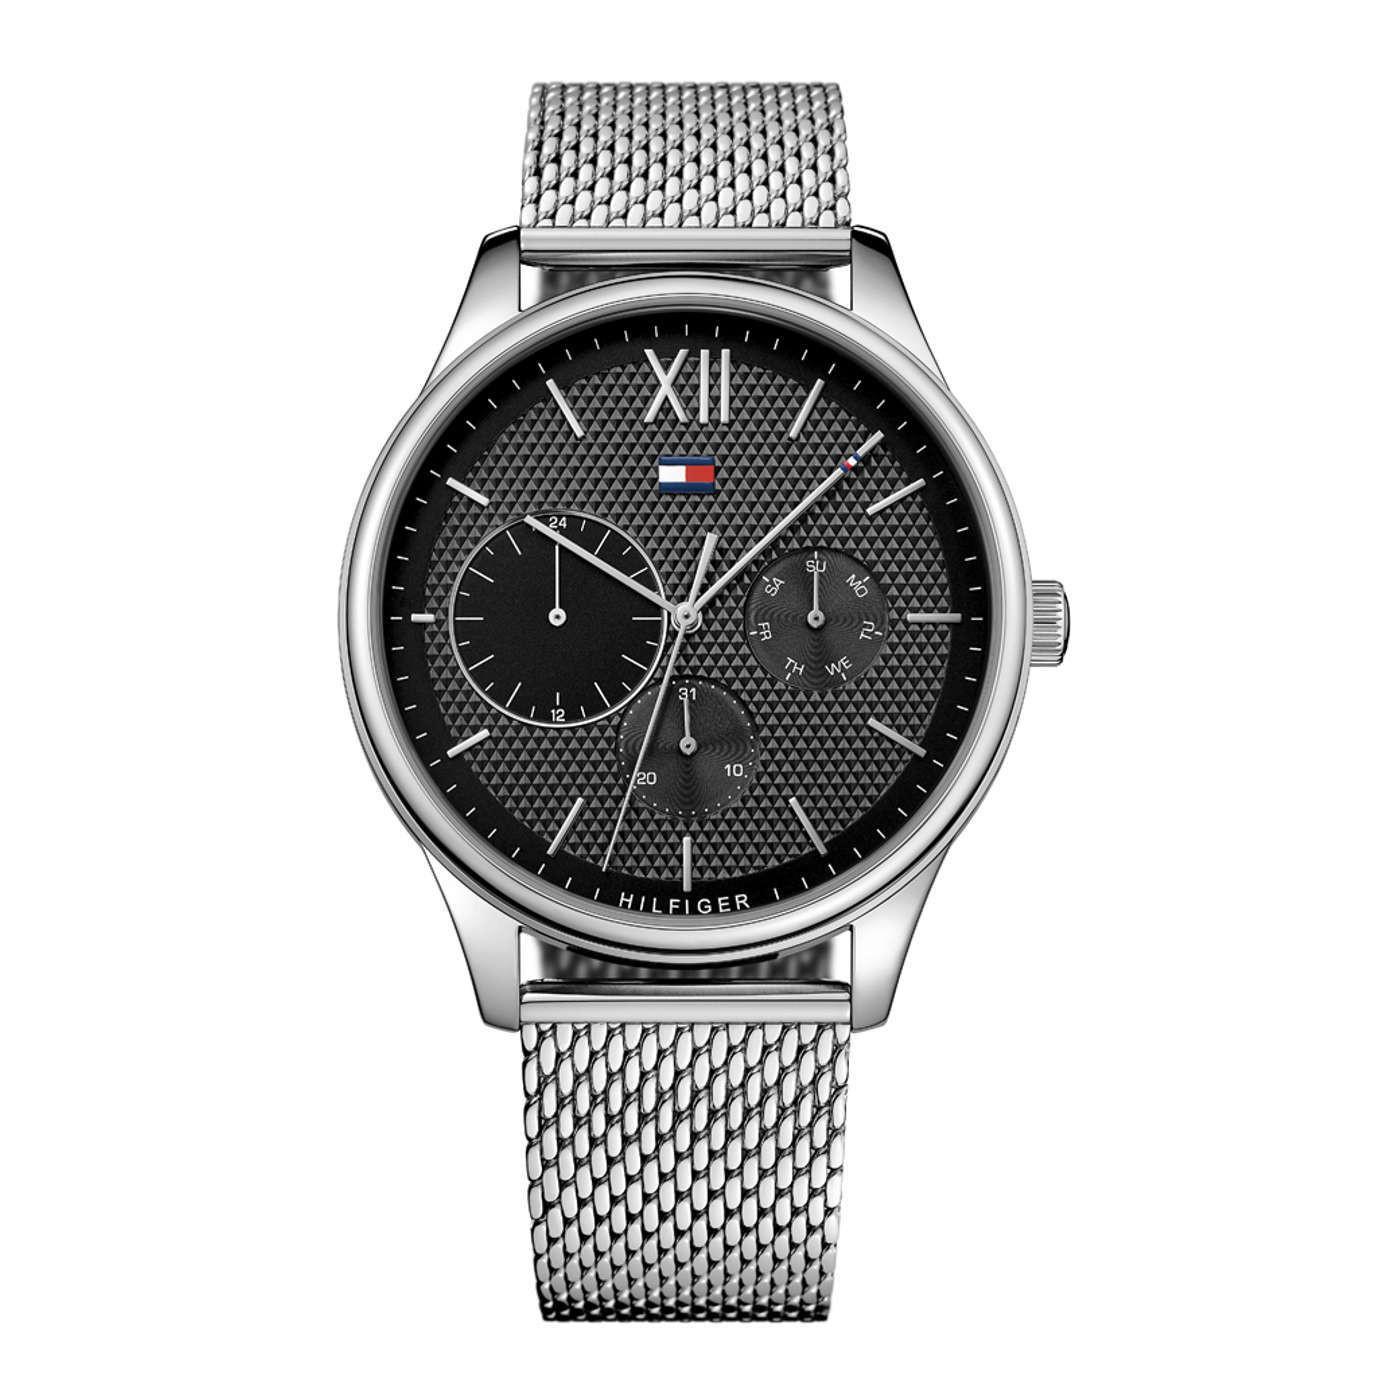 8b684dc68 Tommy Hilfiger Sport watch TH1791415 - Watches